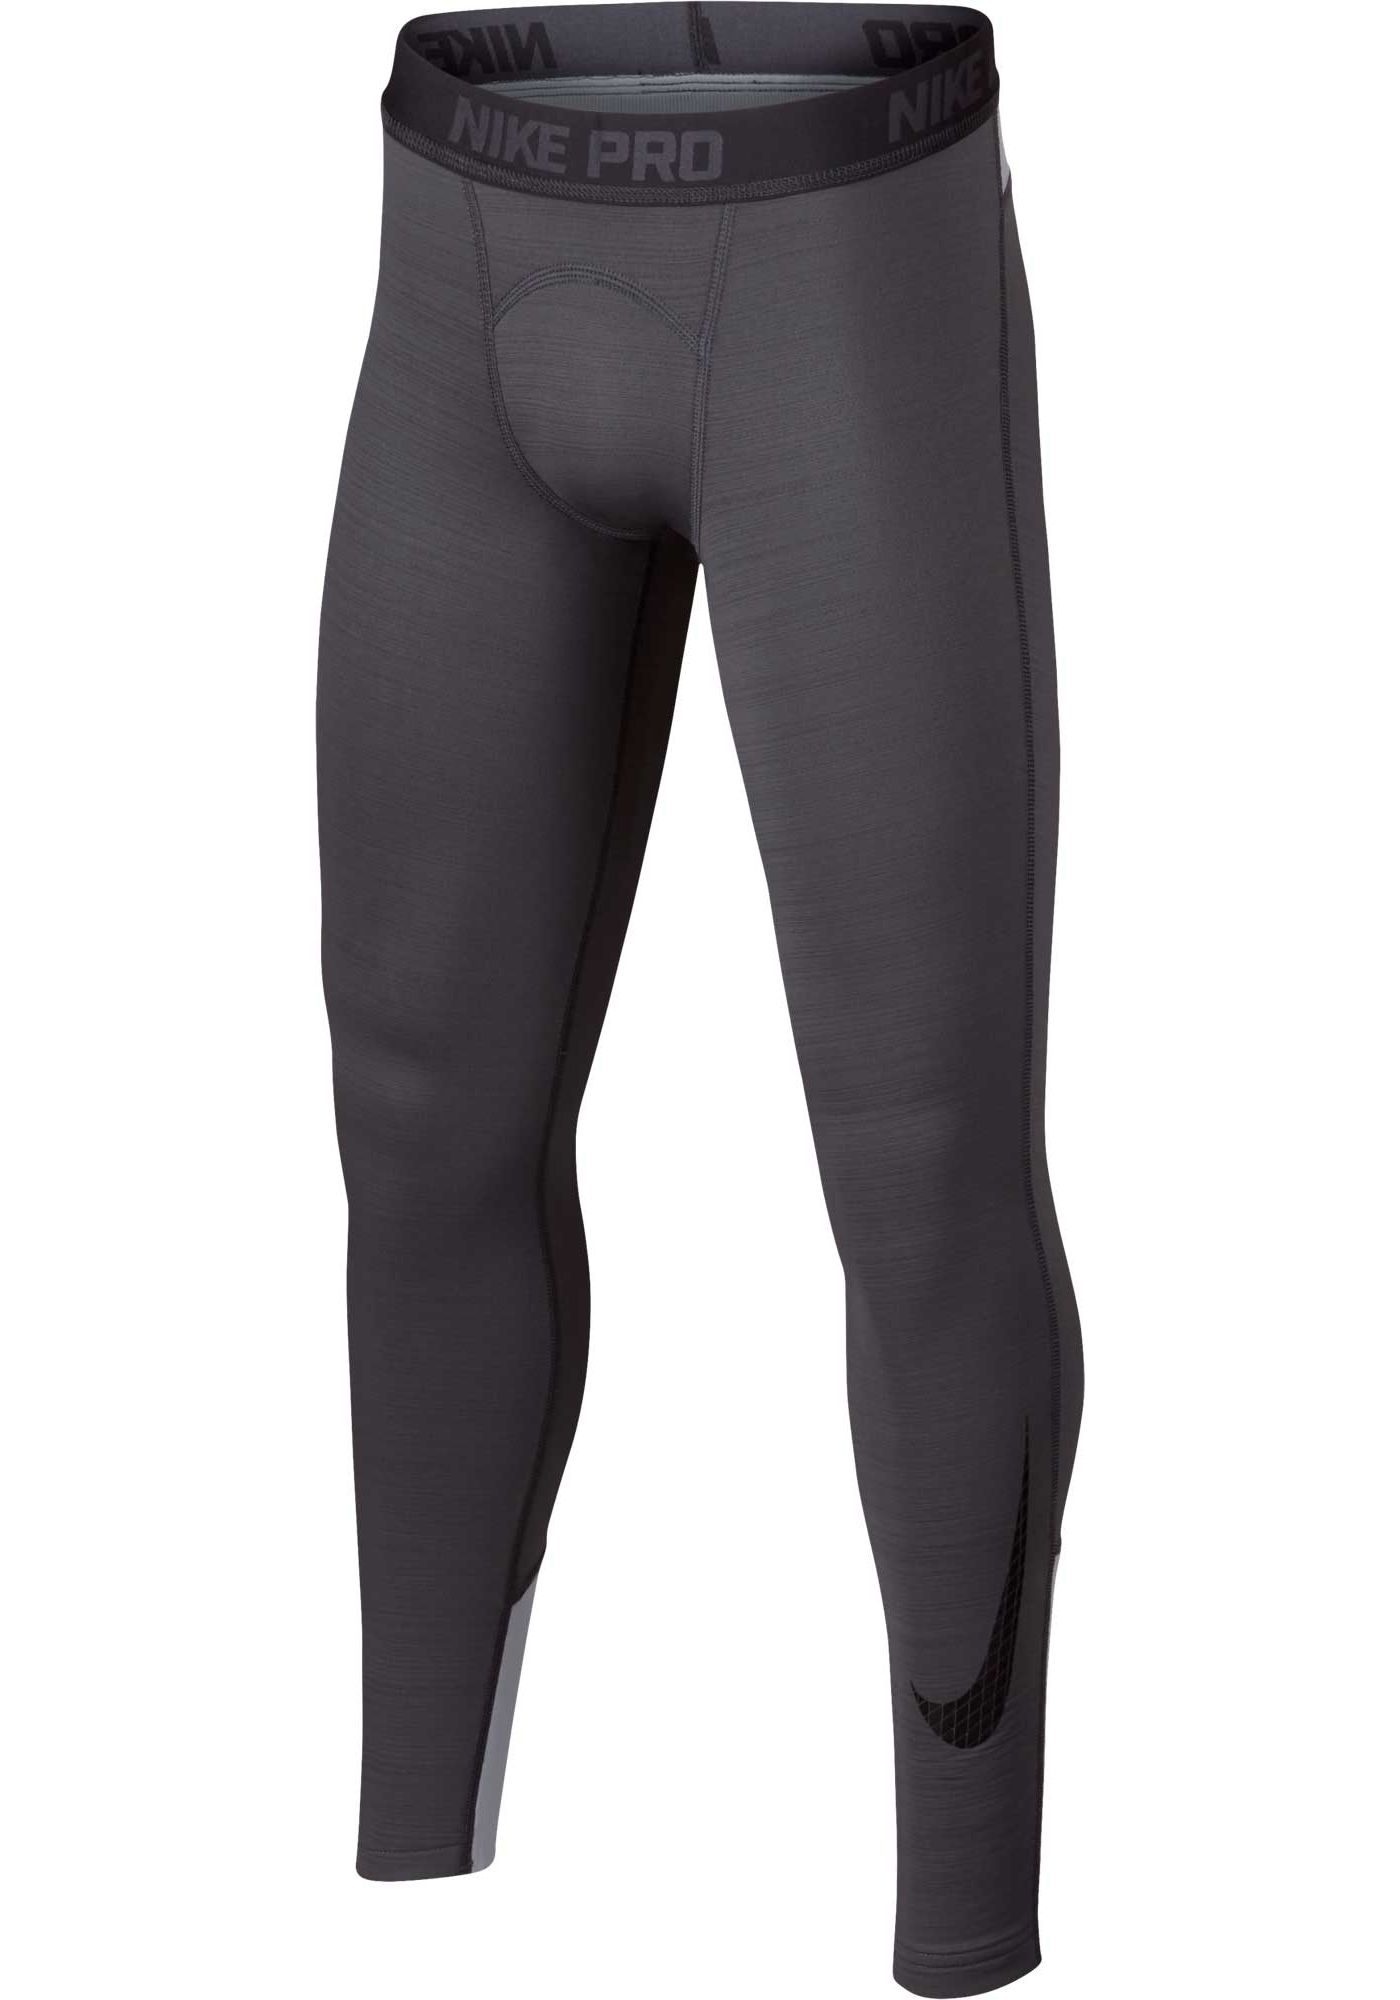 Nike Boys' Dri-FIT Cold Weather Compression Leggings